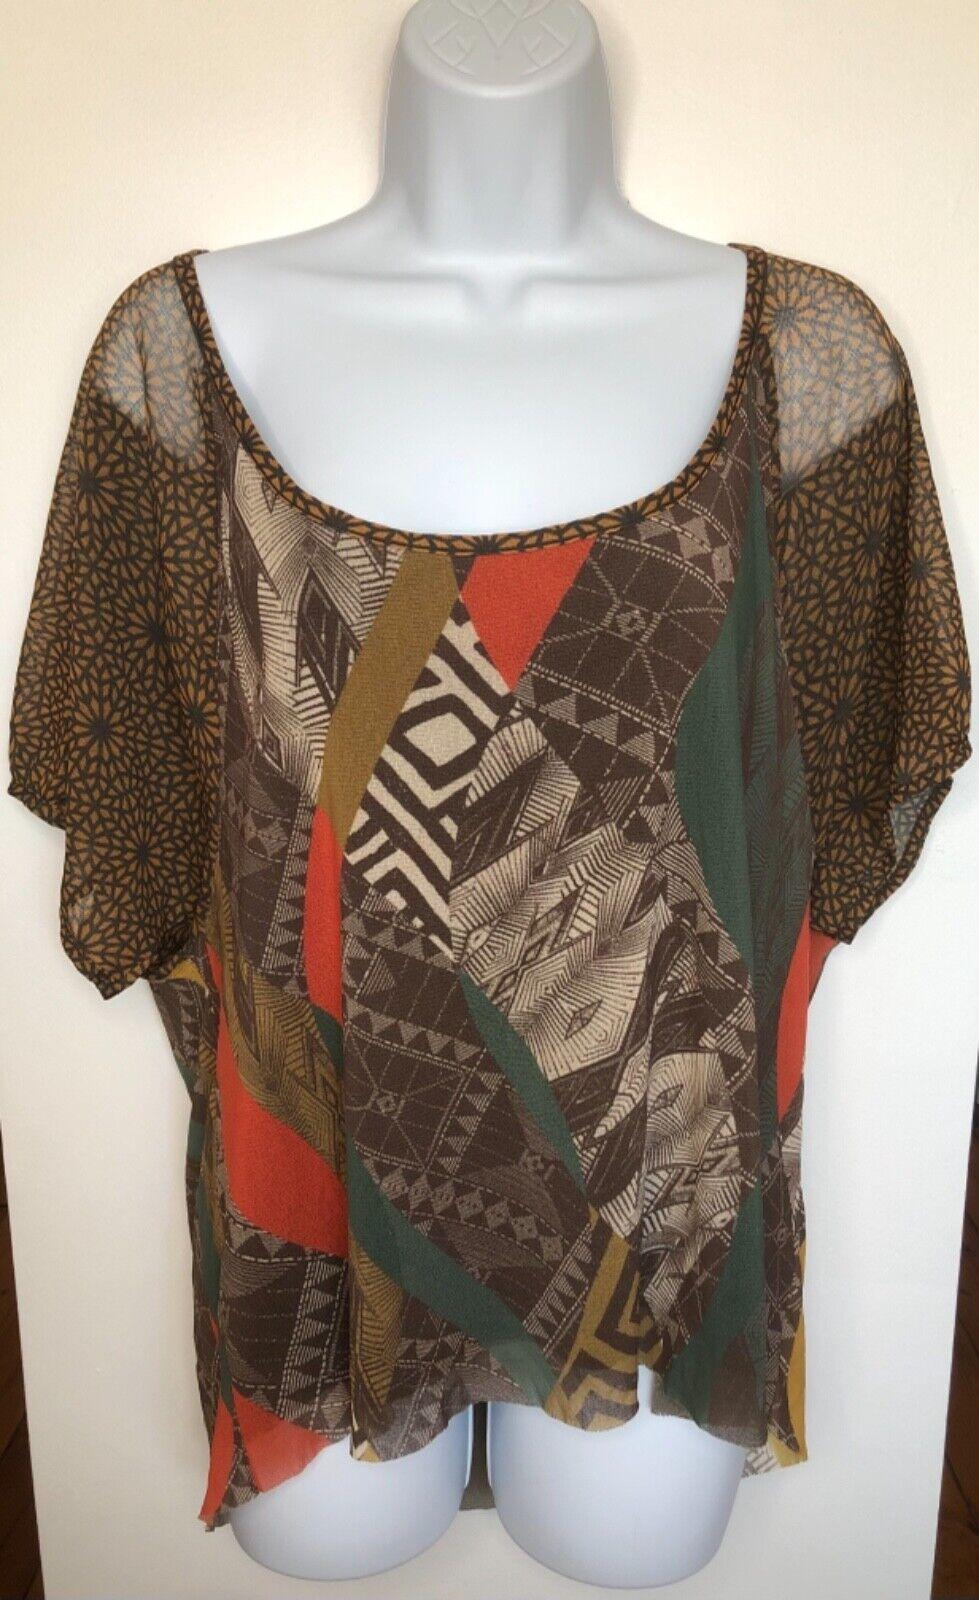 WESTON WEAR Womens Size Small Nylon Shirt Sheer M… - image 2